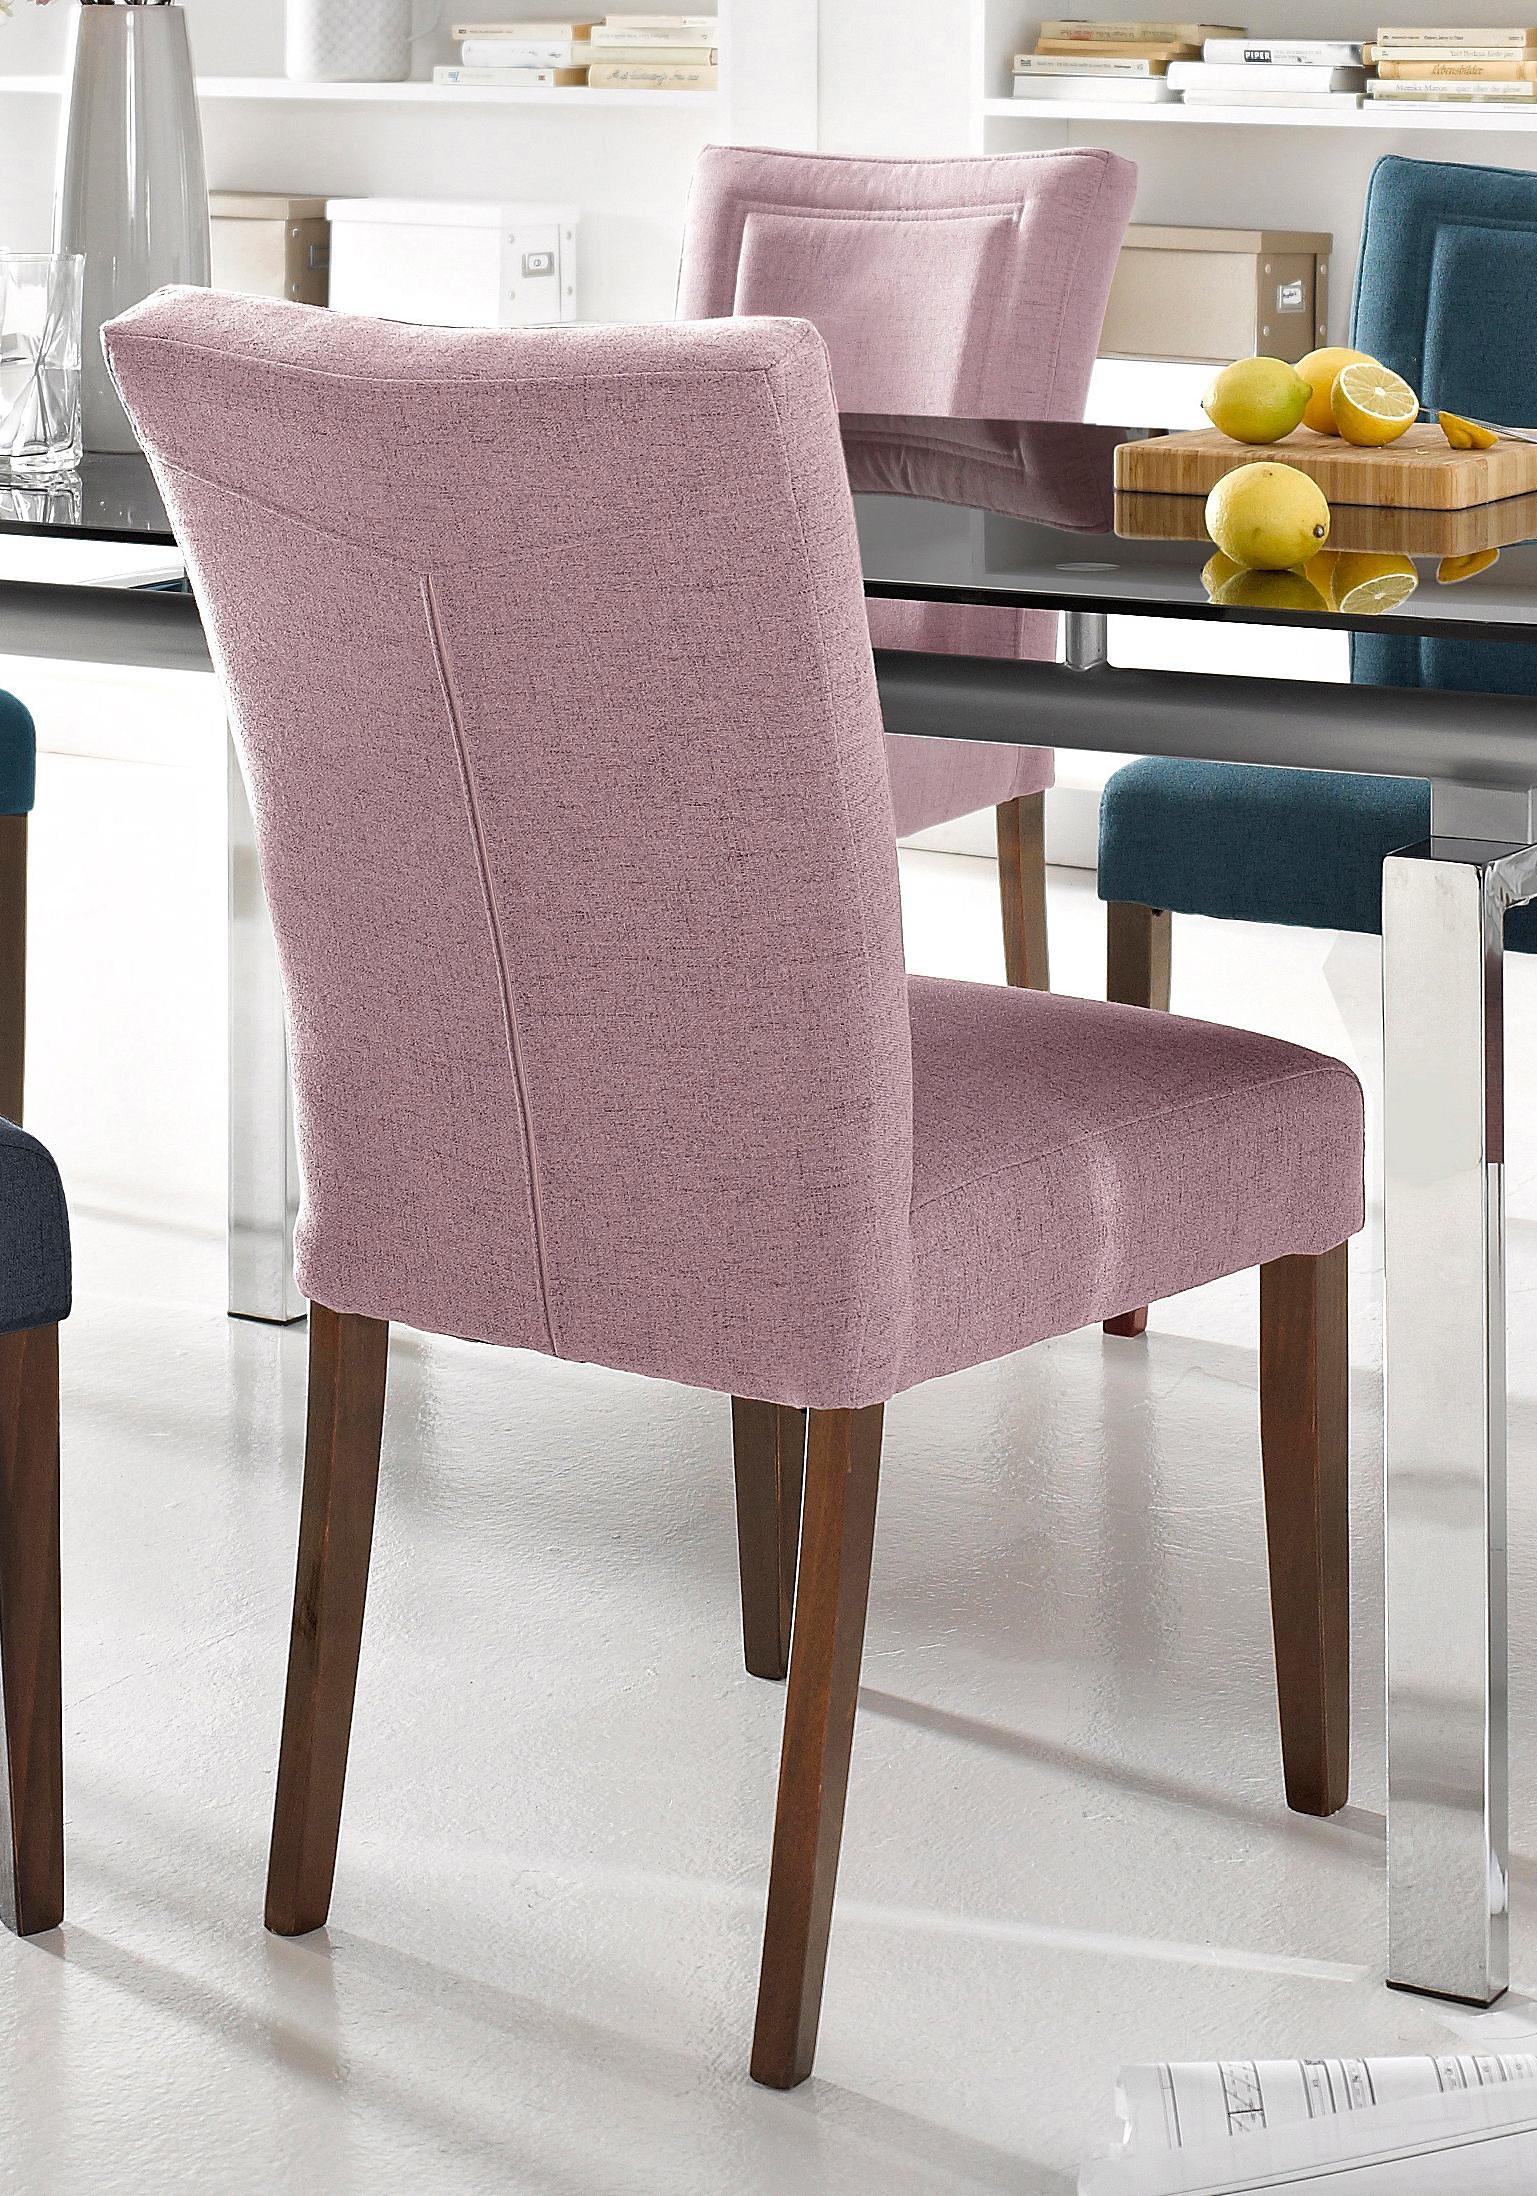 stoel set van 2 snel online gekocht otto. Black Bedroom Furniture Sets. Home Design Ideas